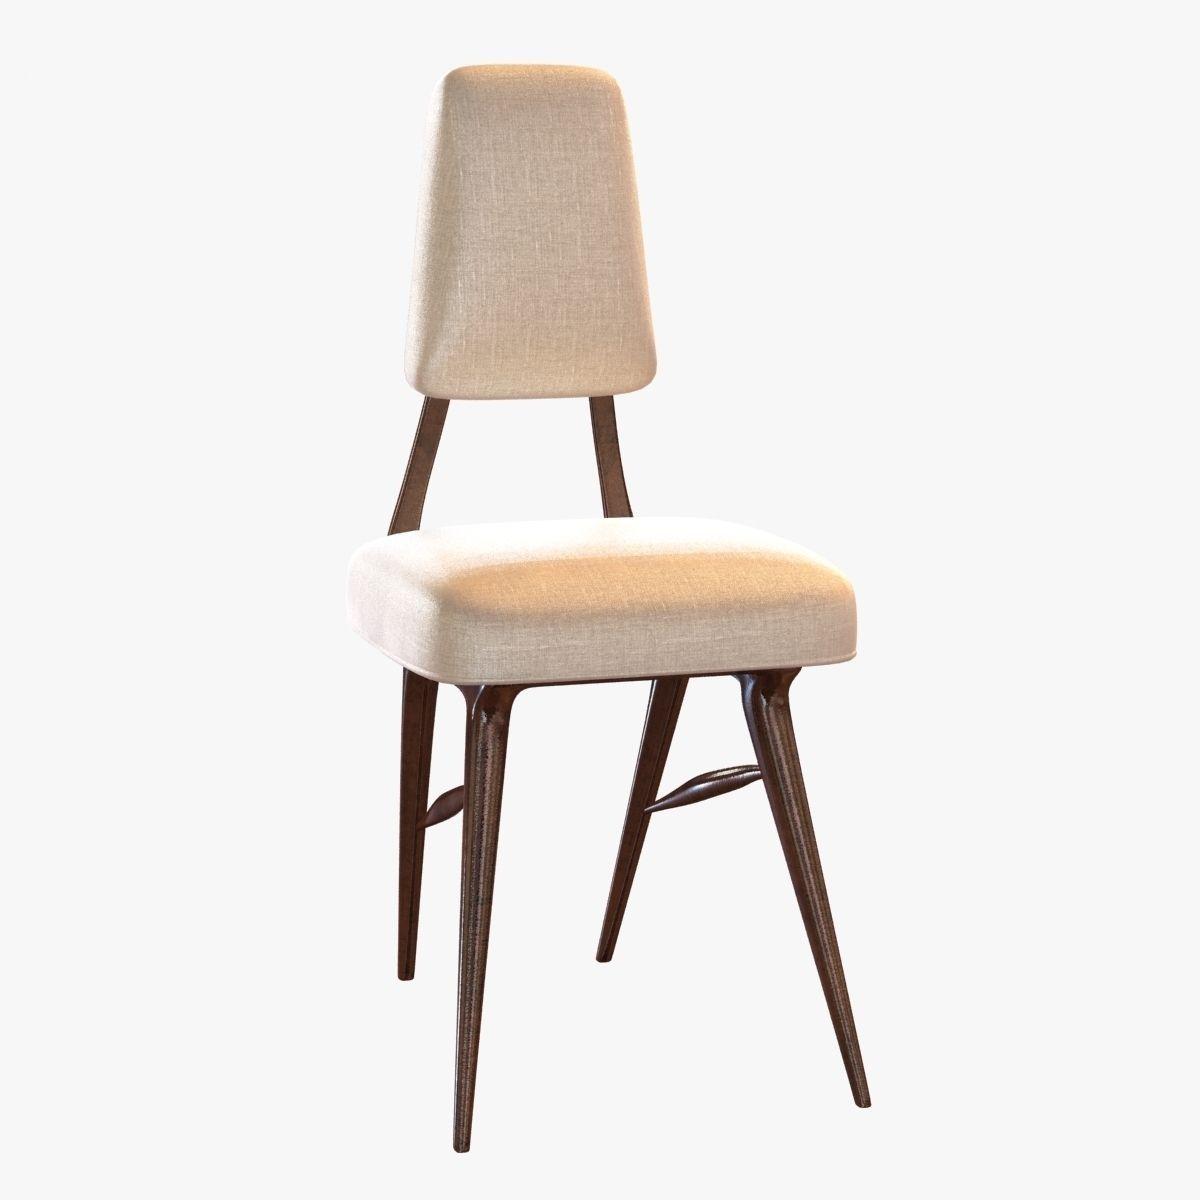 deniot dining chair 3D Model MAX OBJ 3DS FBX MTL  : deniot dining chair 3d model max obj 3ds fbx from www.cgtrader.com size 1200 x 1200 jpeg 52kB